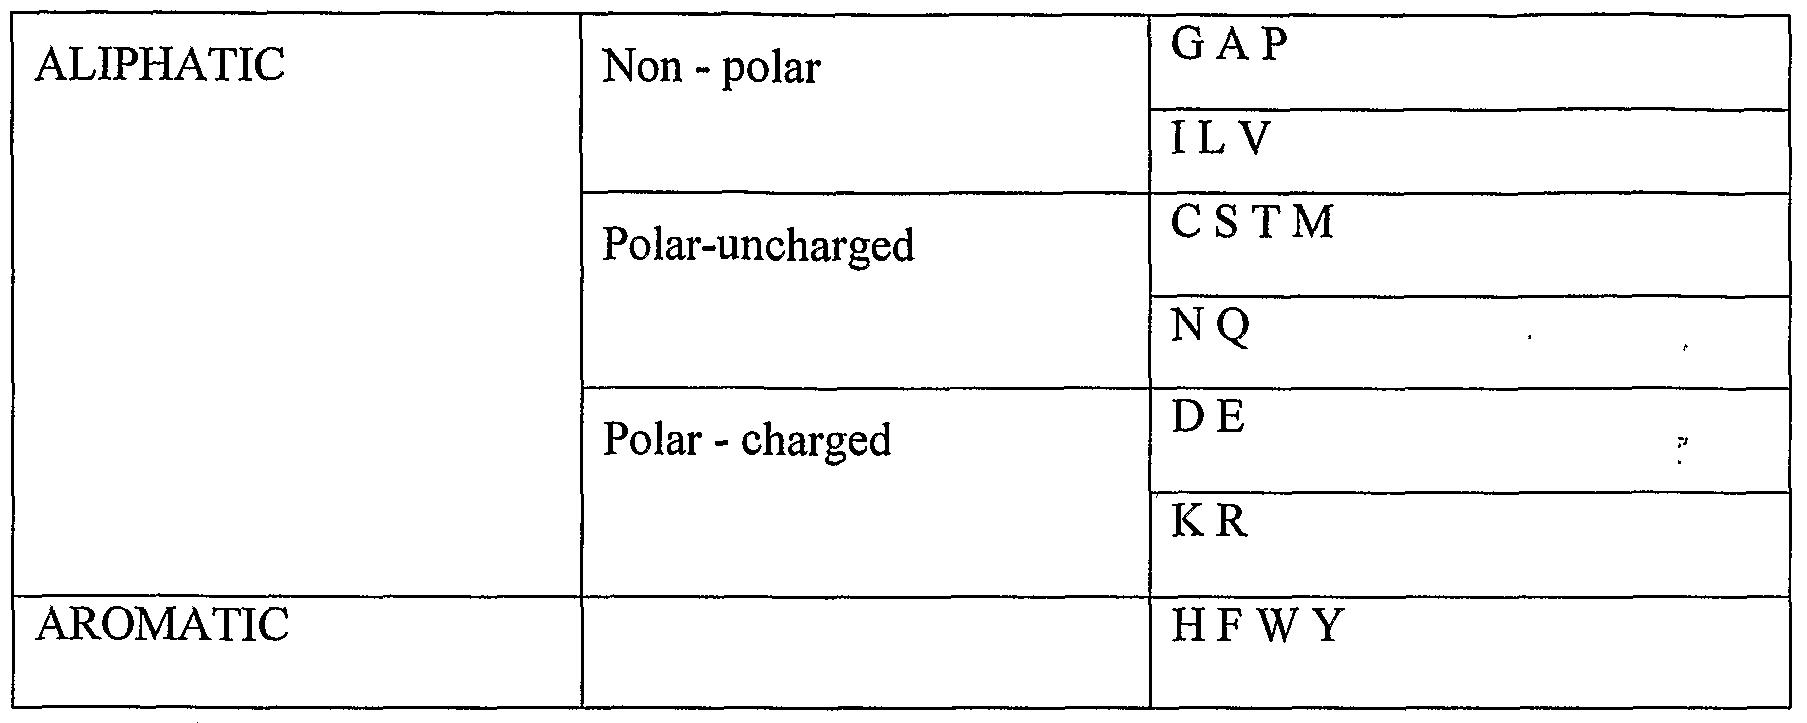 WO2007020658A2 - 'a novel homology model of the glycogen